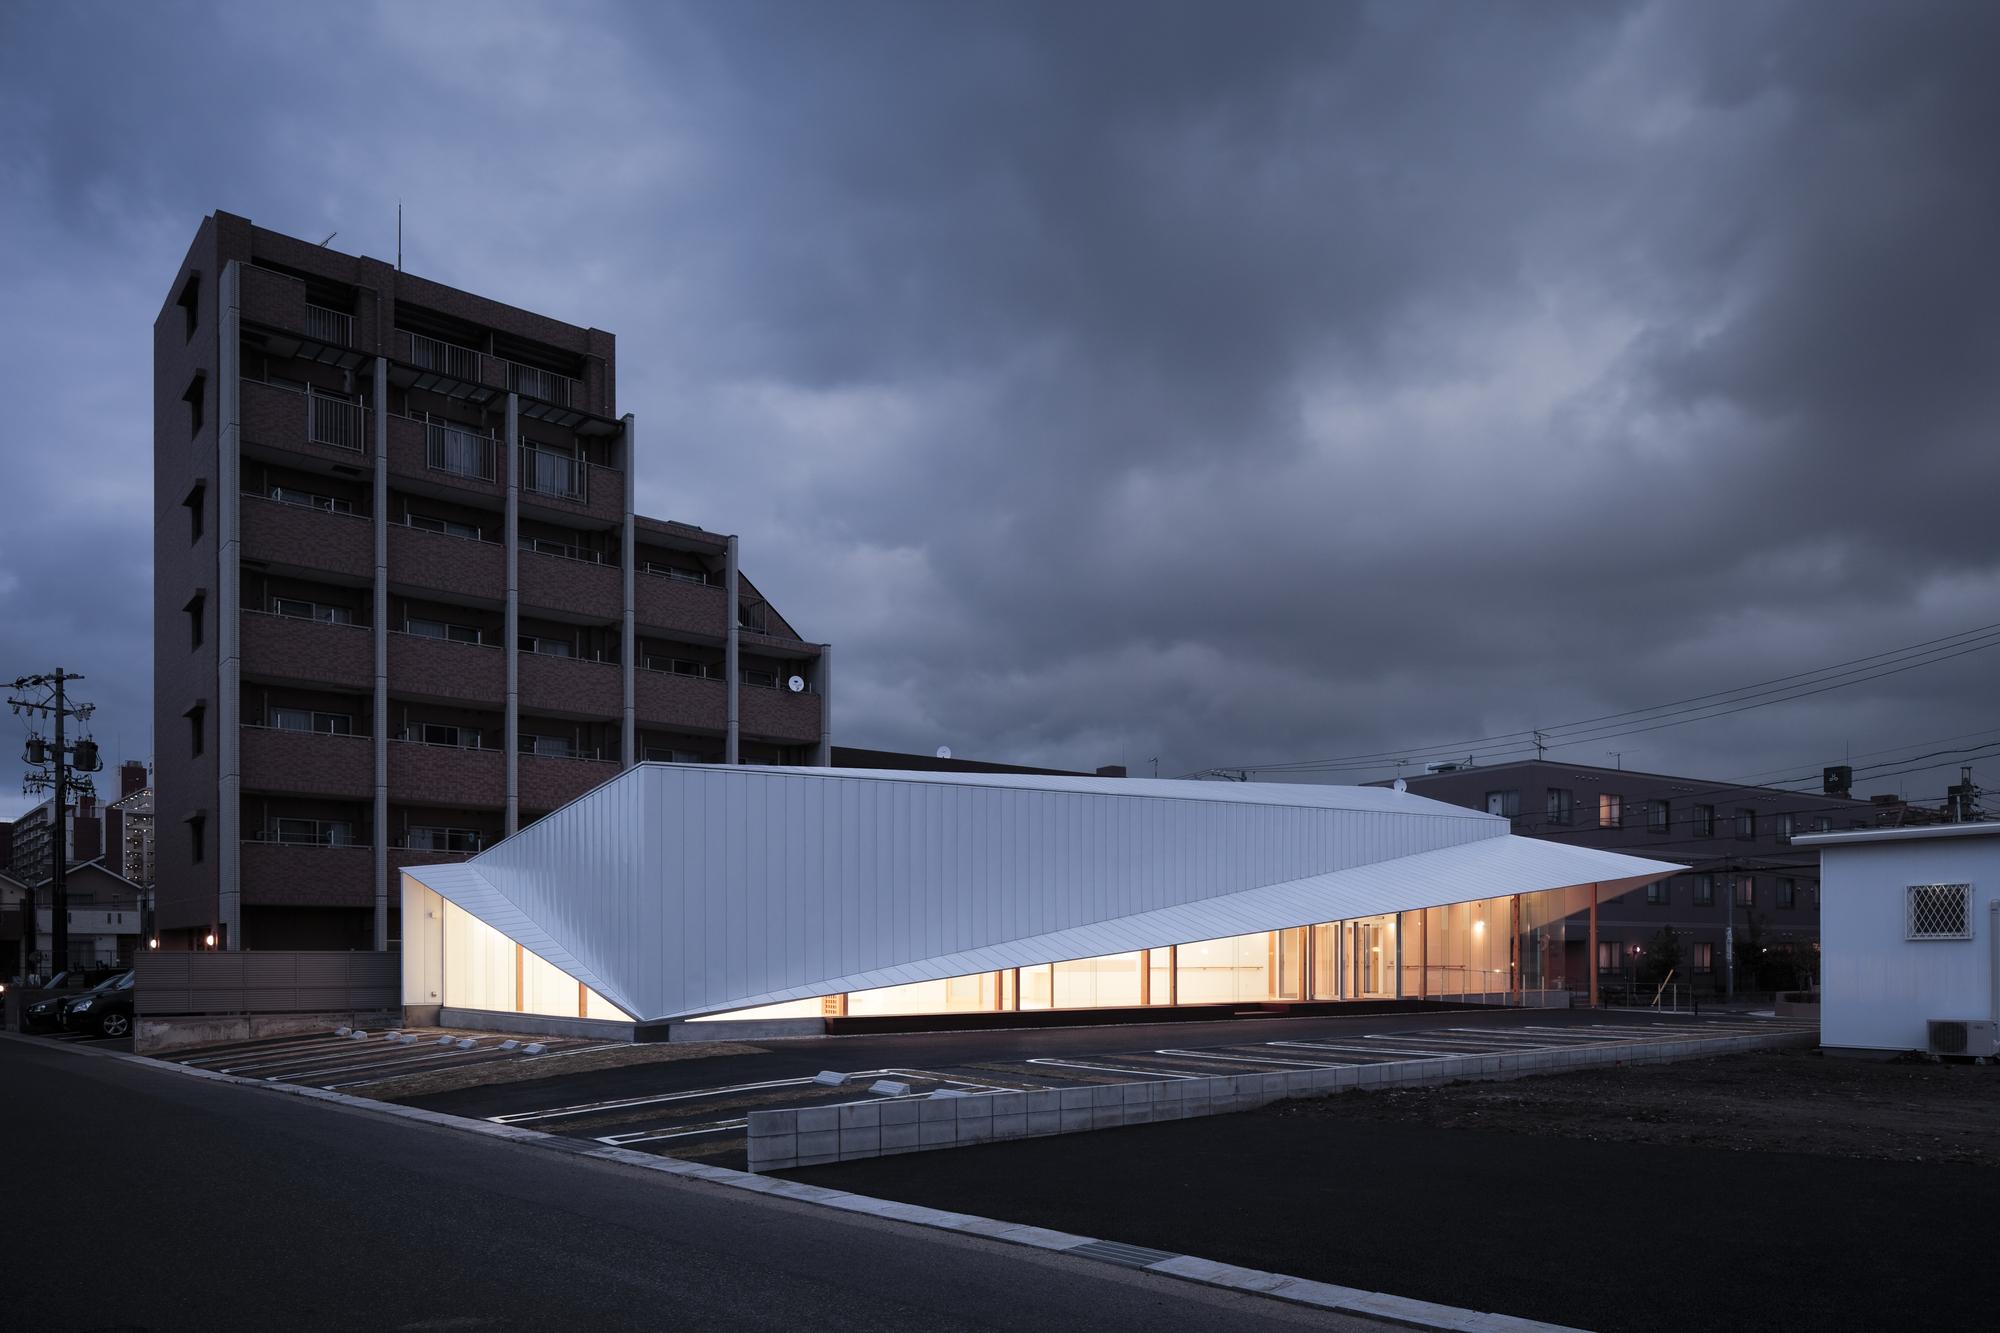 Clínica Majima / D.I.G Architects, © Tomohiro Sakashita